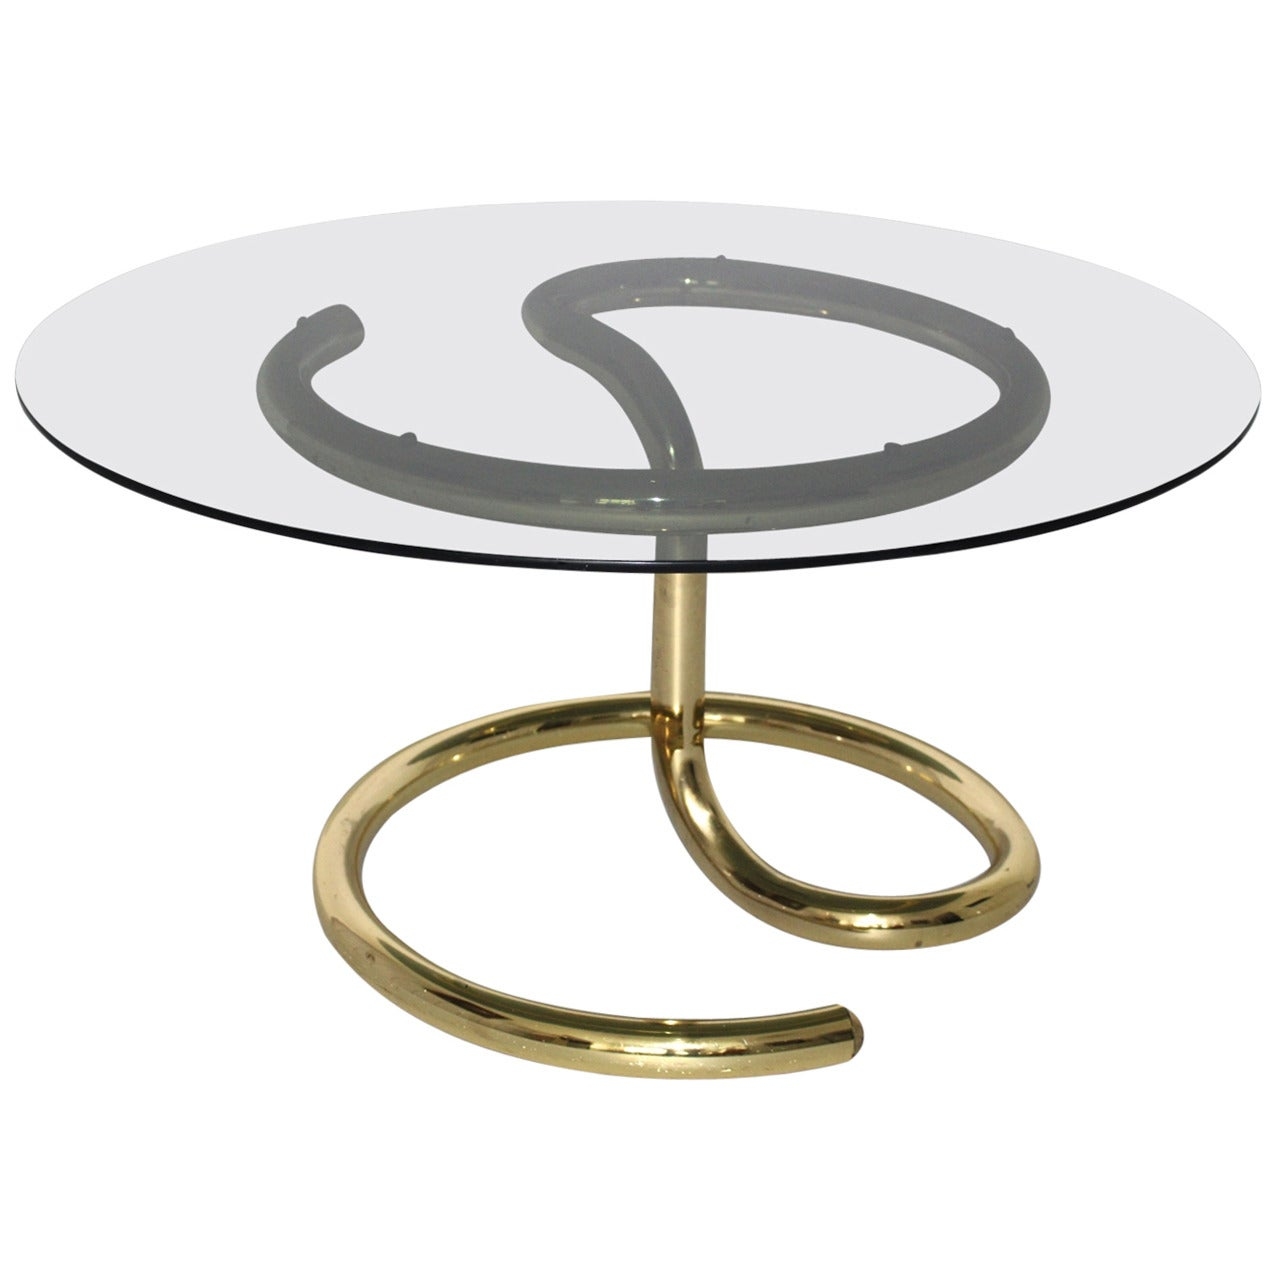 Brass Plated Vintage Mid Century Modern Coffee Table Anaconda 1970